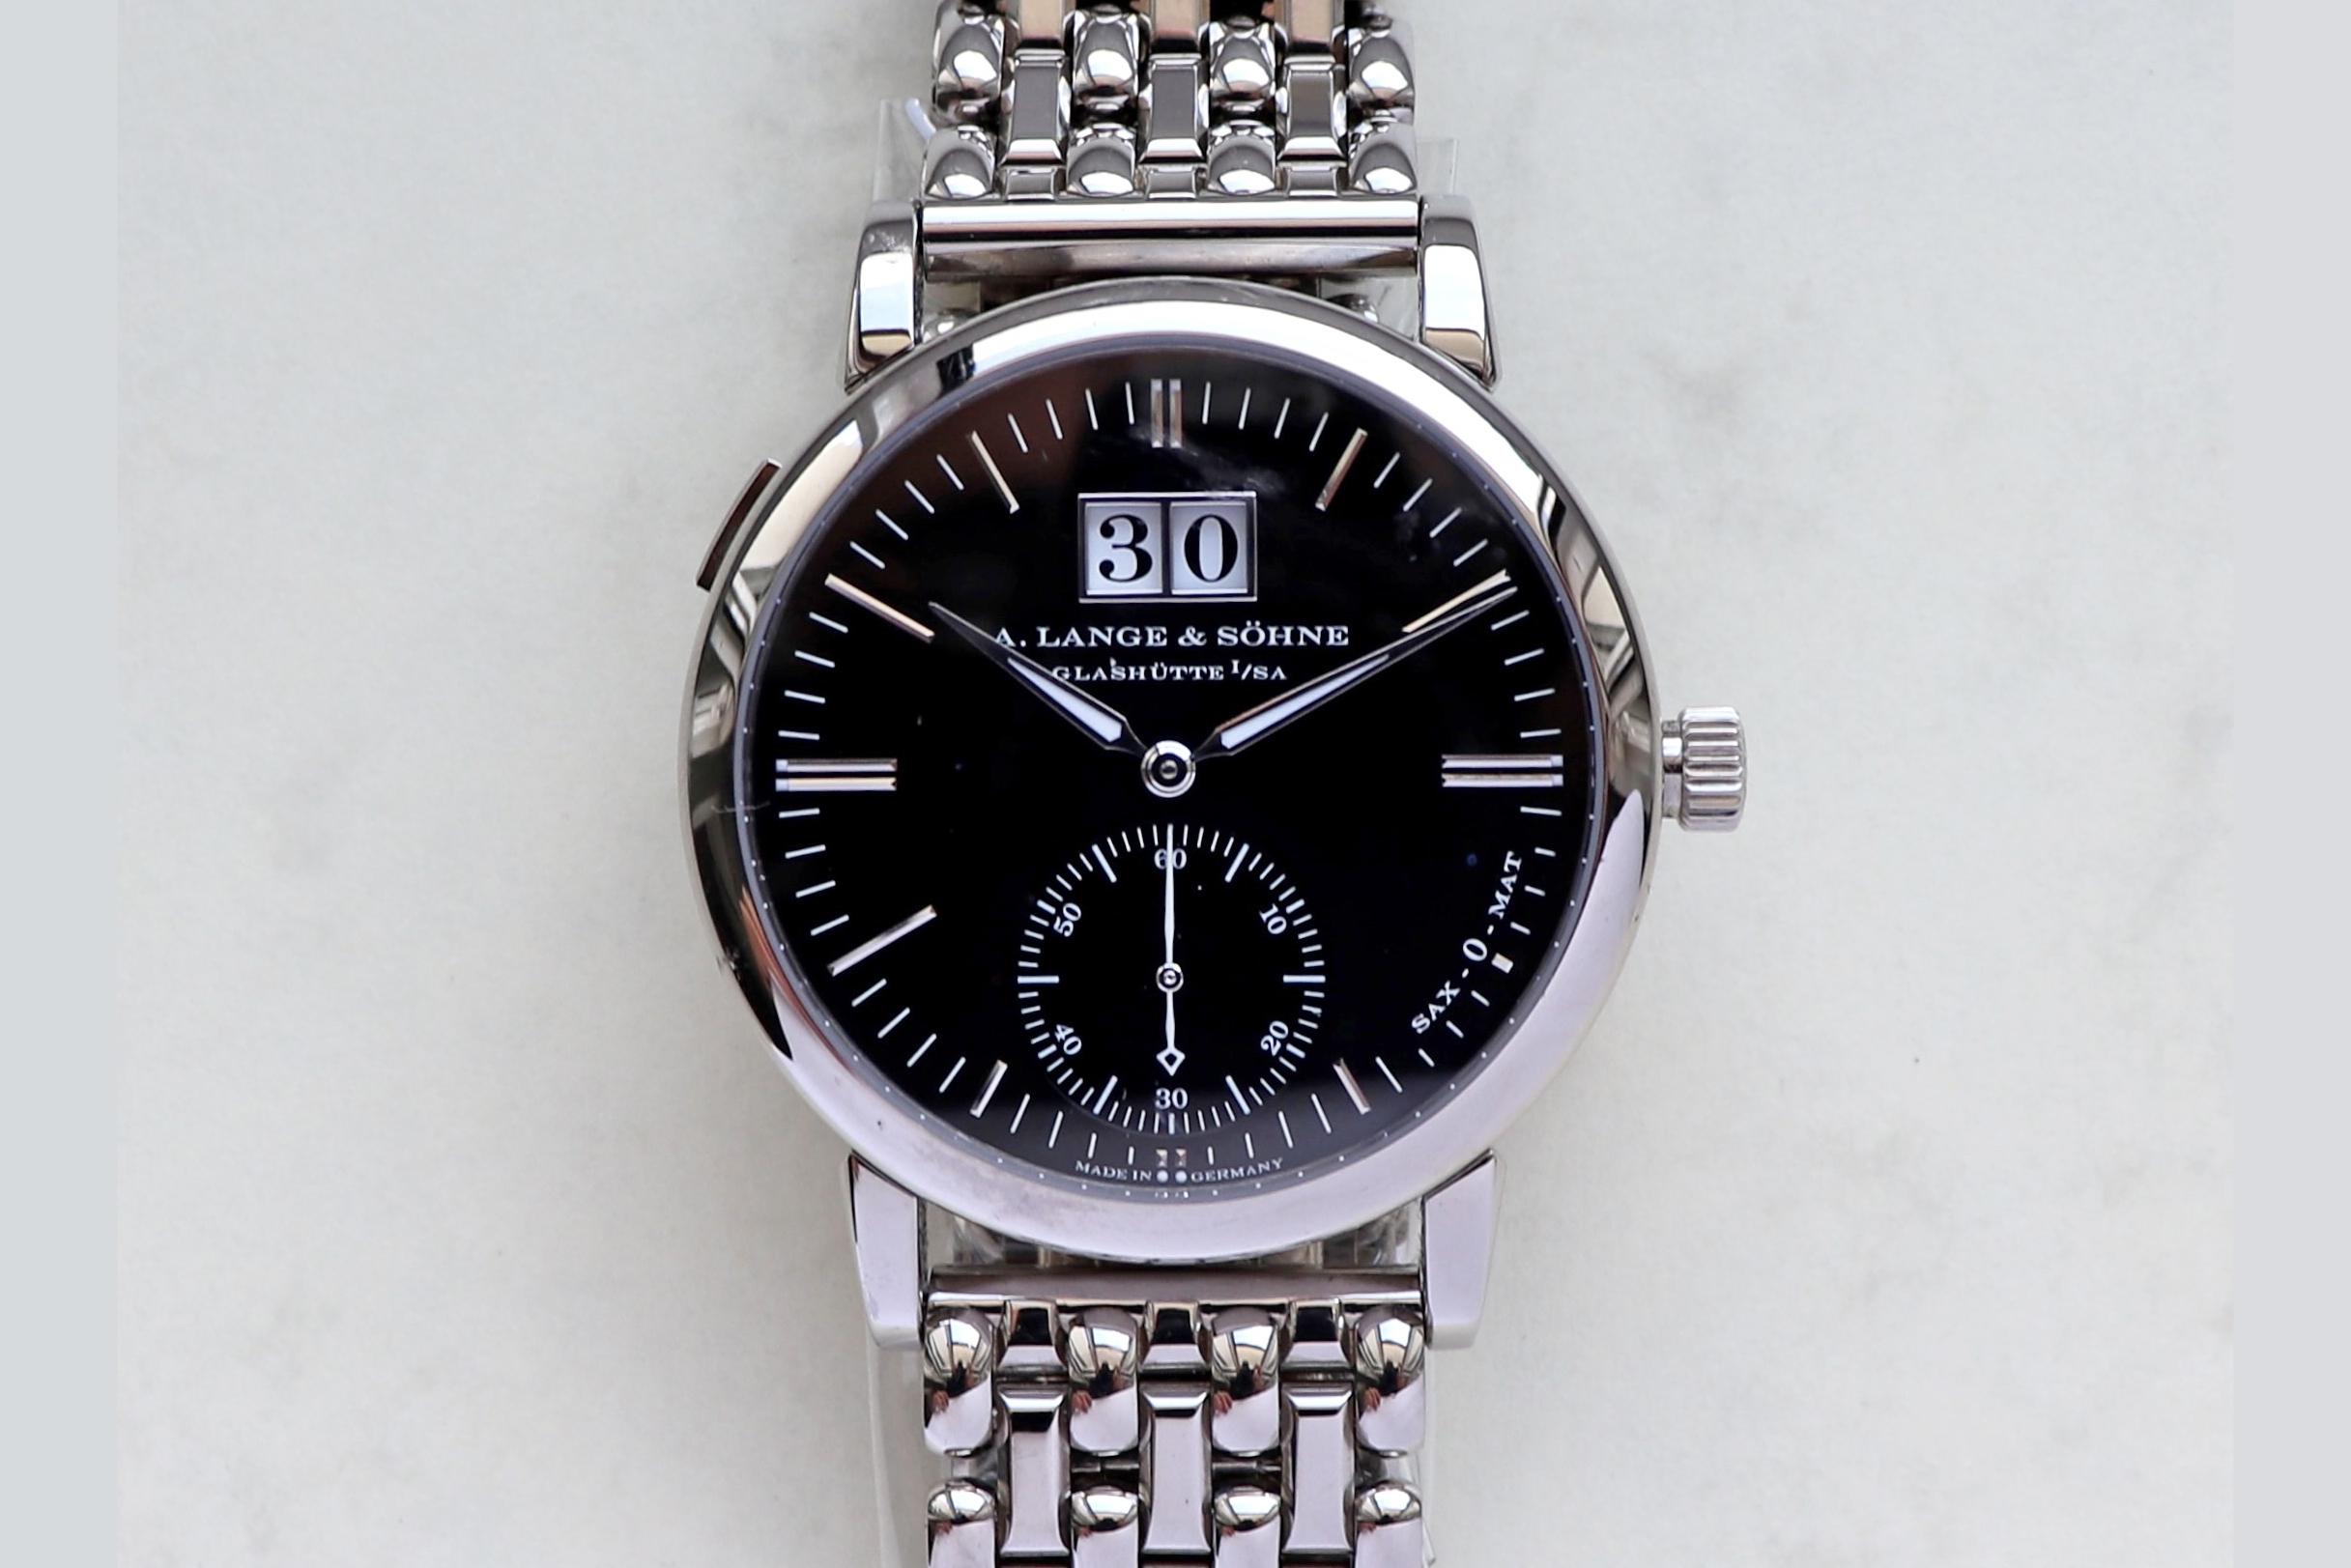 langematik big date white gold black dial 308.027 with wellendorff bracelet